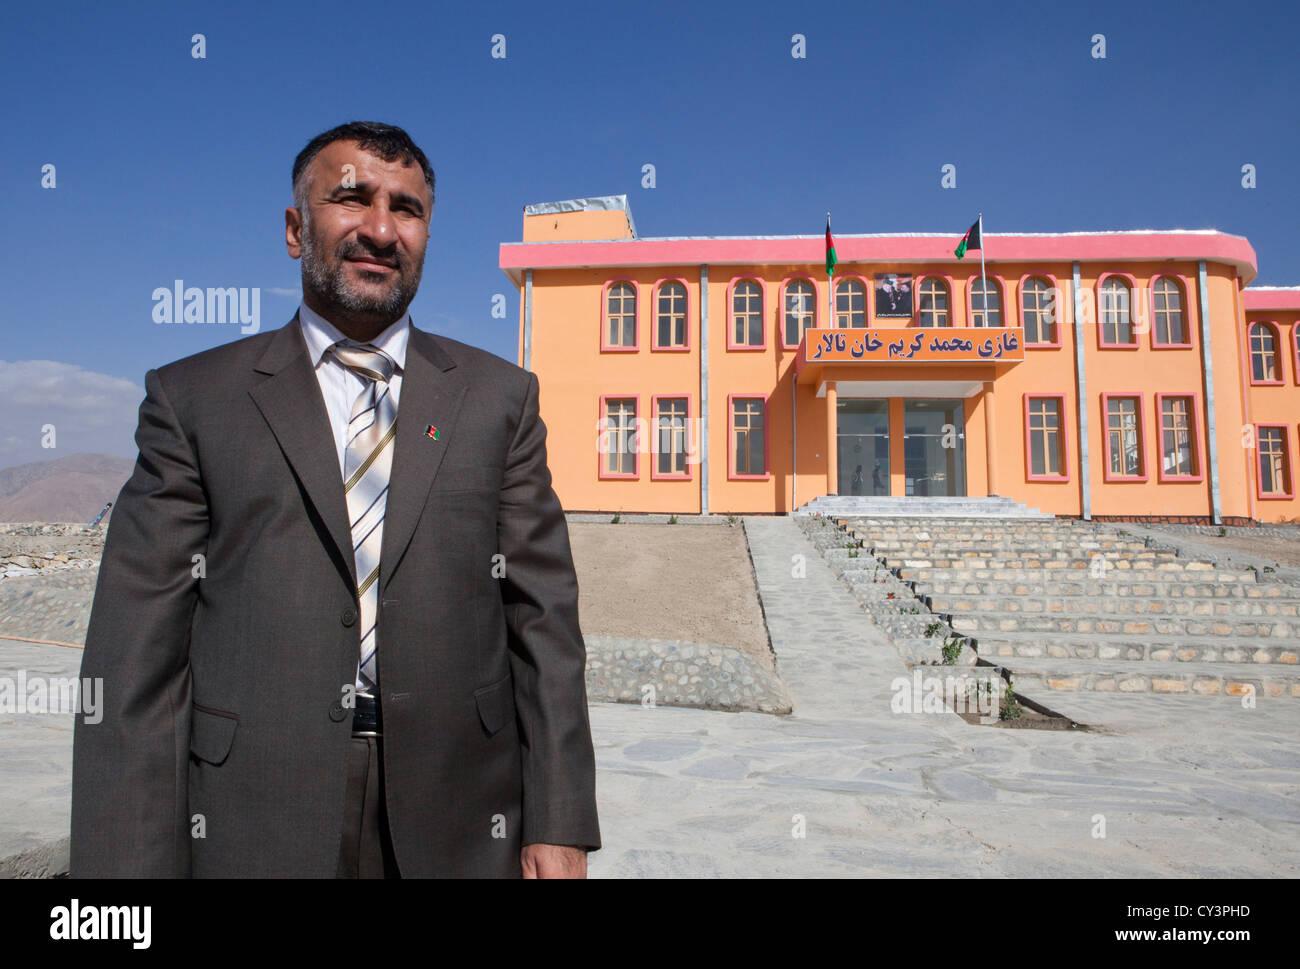 Ex-governor of Maidan, Wardak province, afghanistan - Stock Image